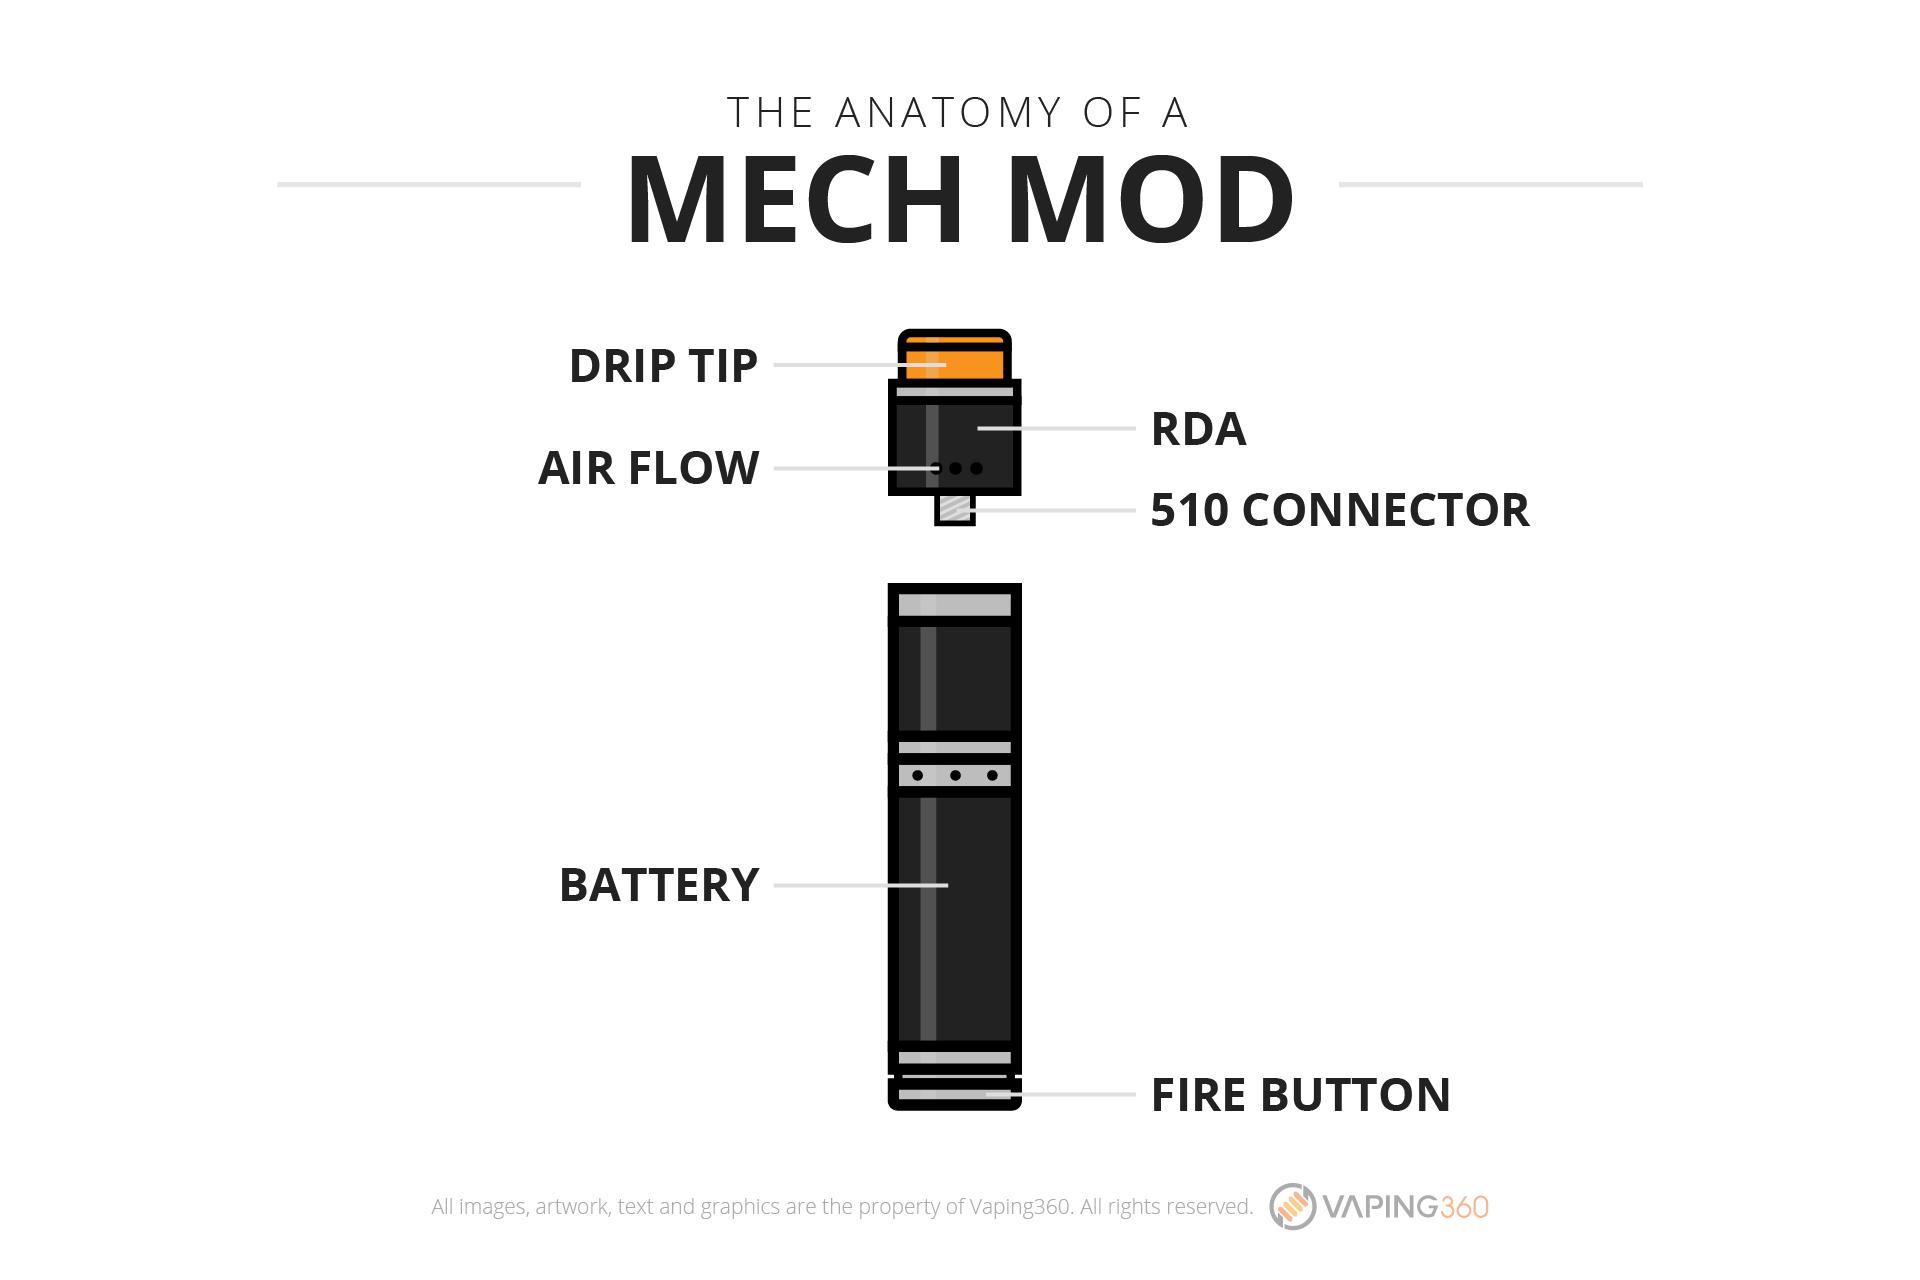 Anatomy of a mech mod